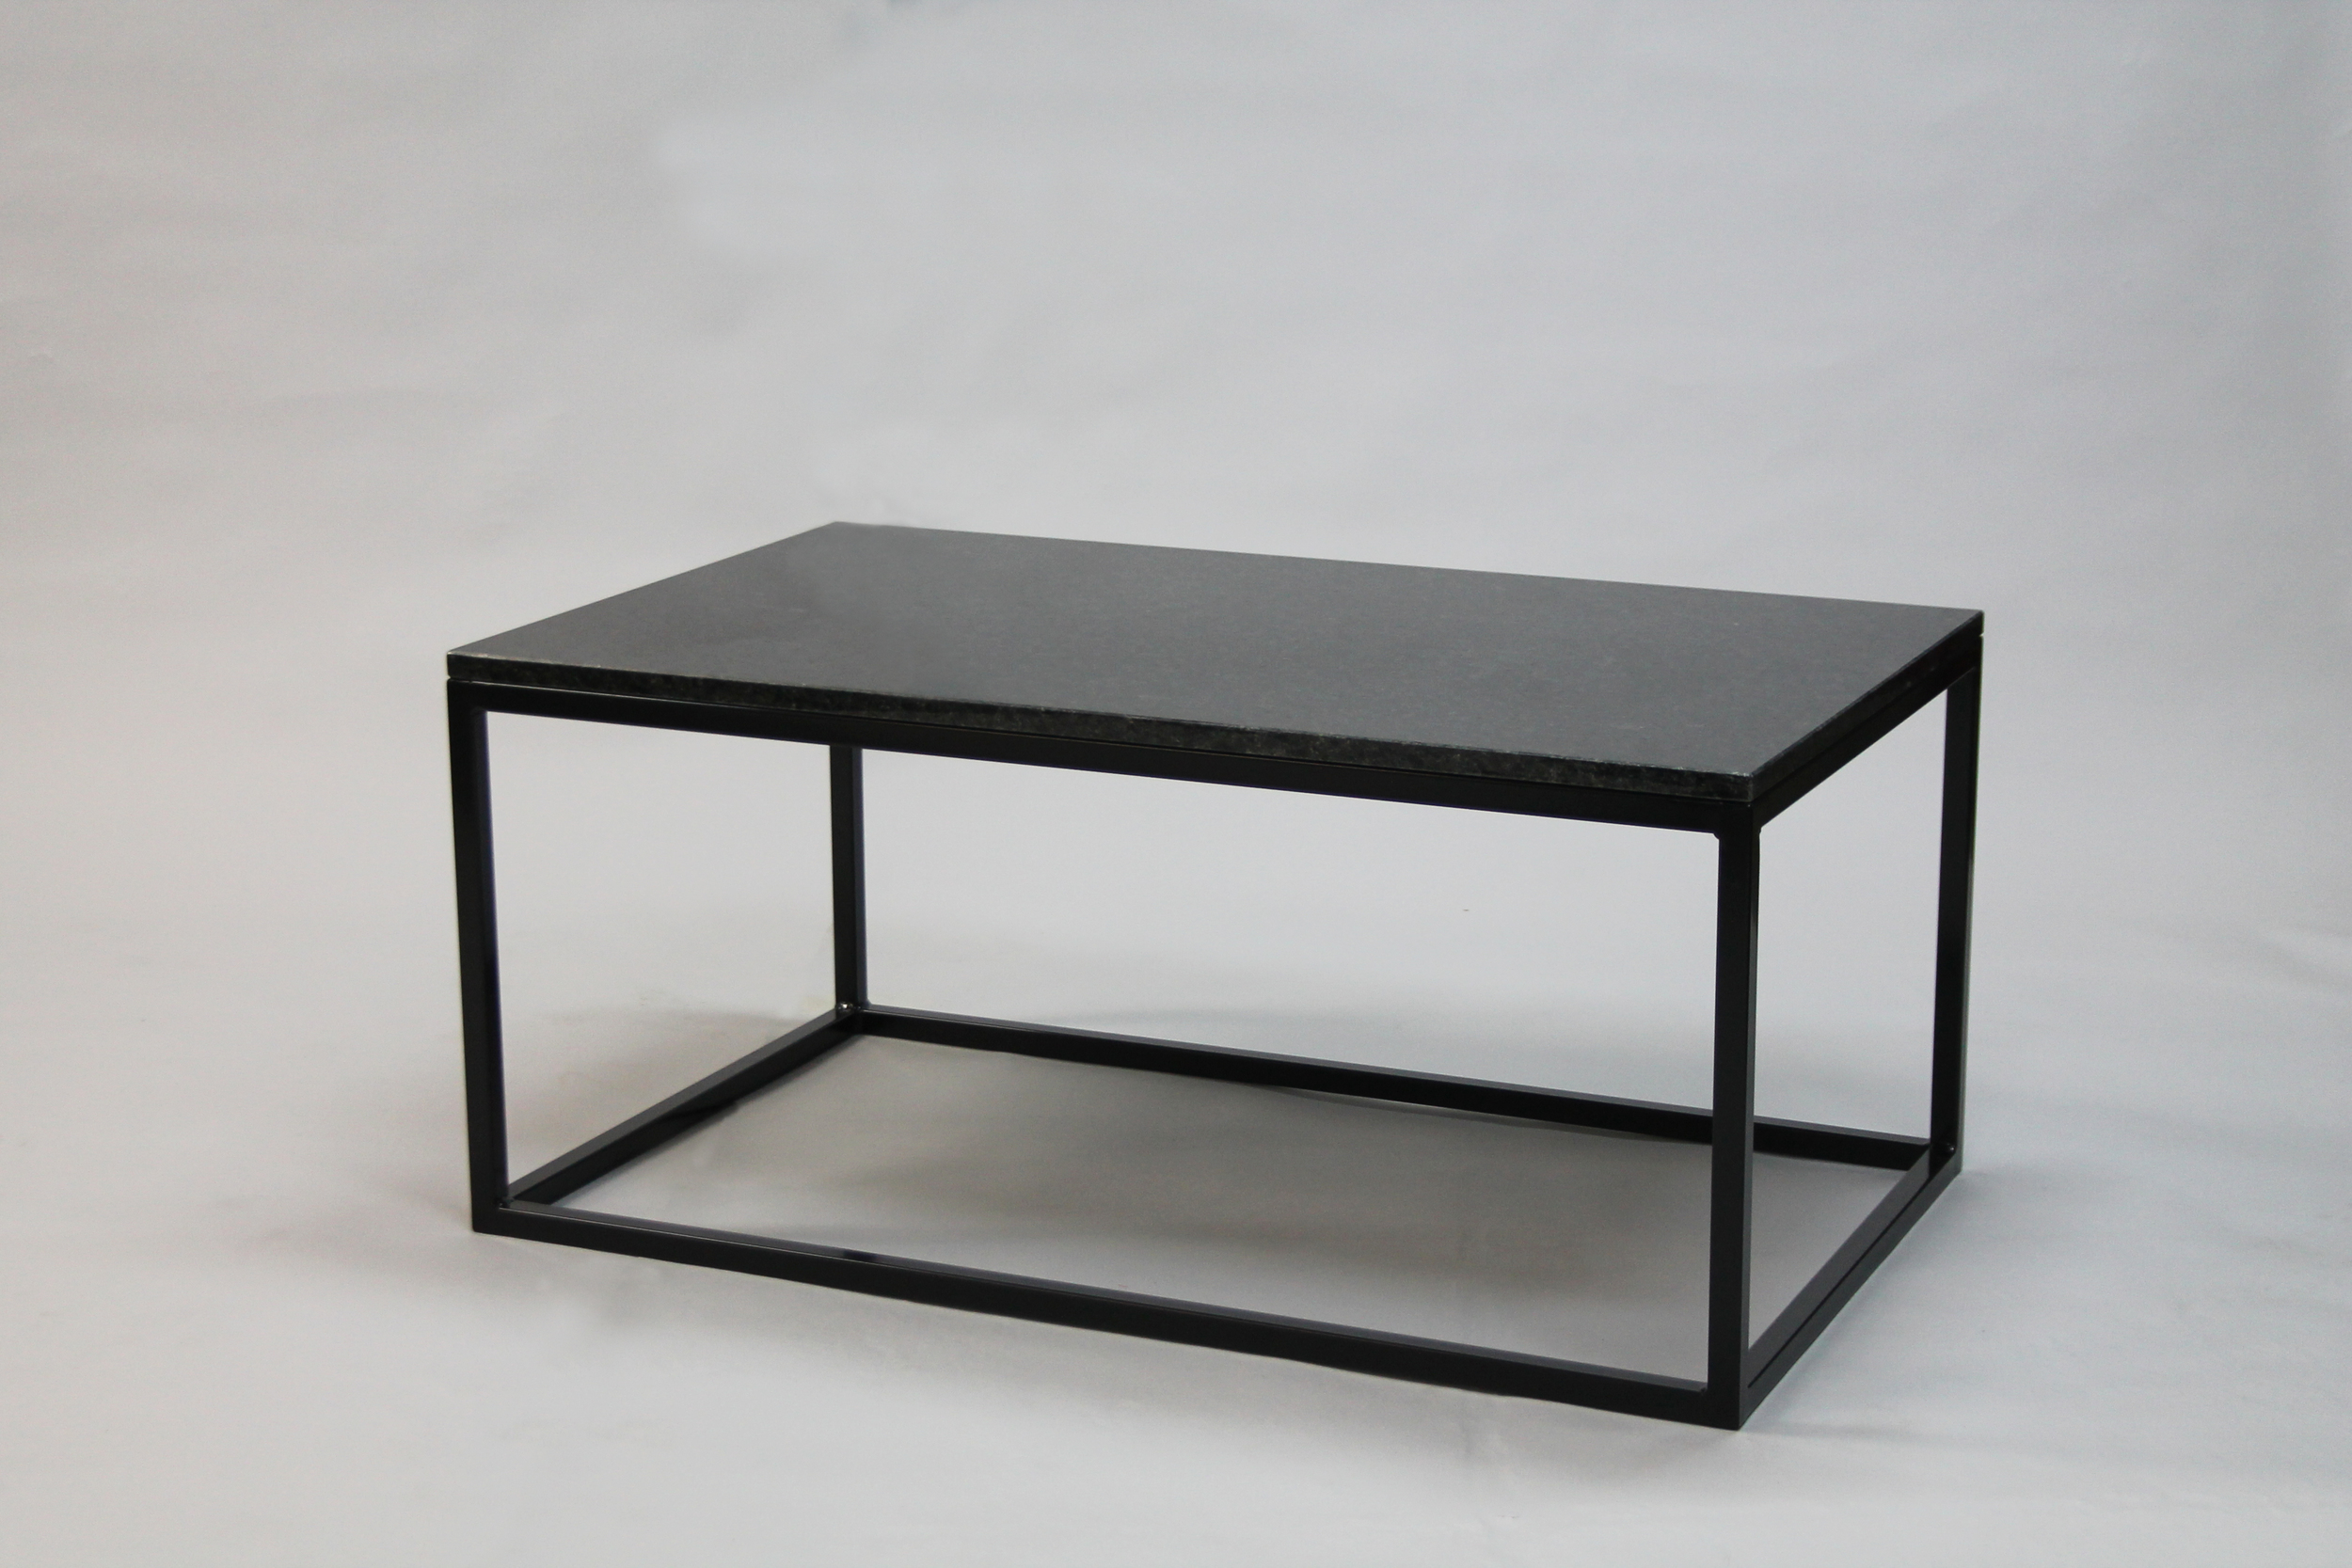 Svartgranit 100x60 H 45 svart kub underrede